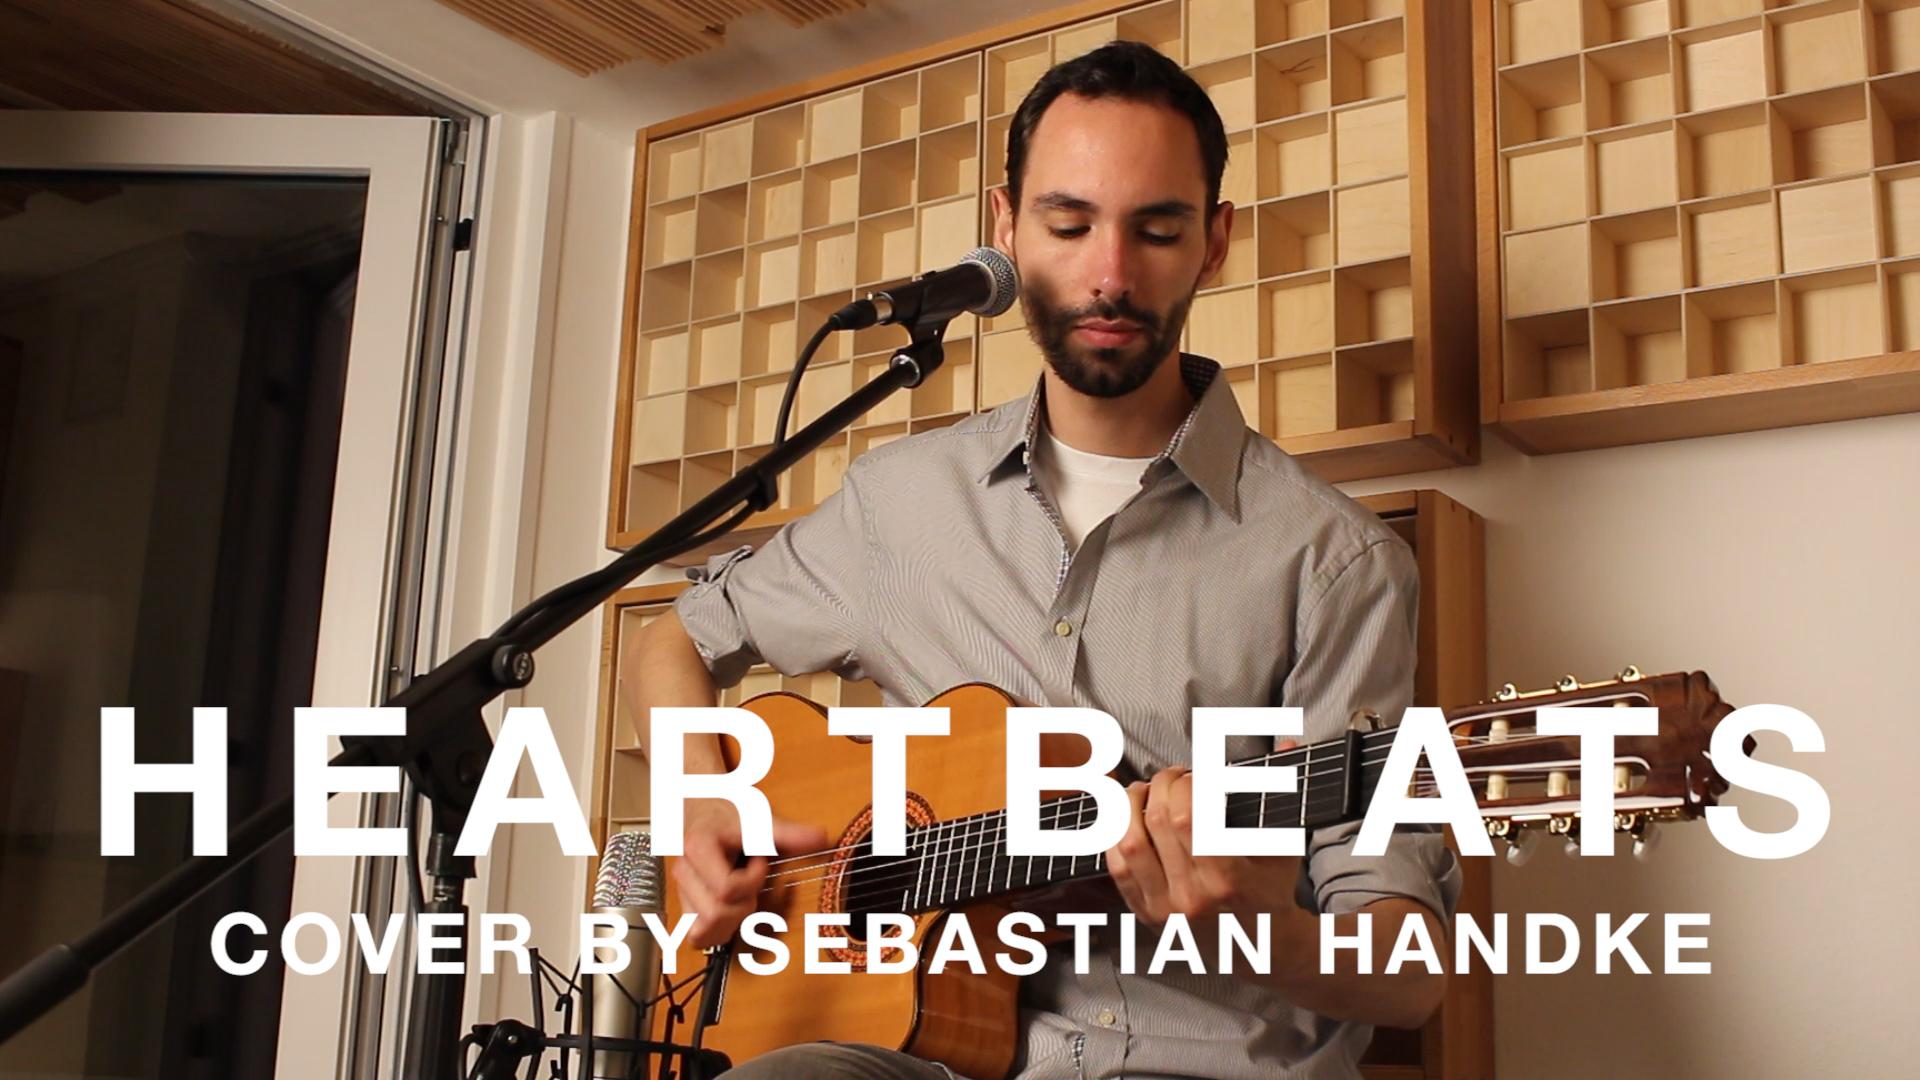 heartbetas-thumb